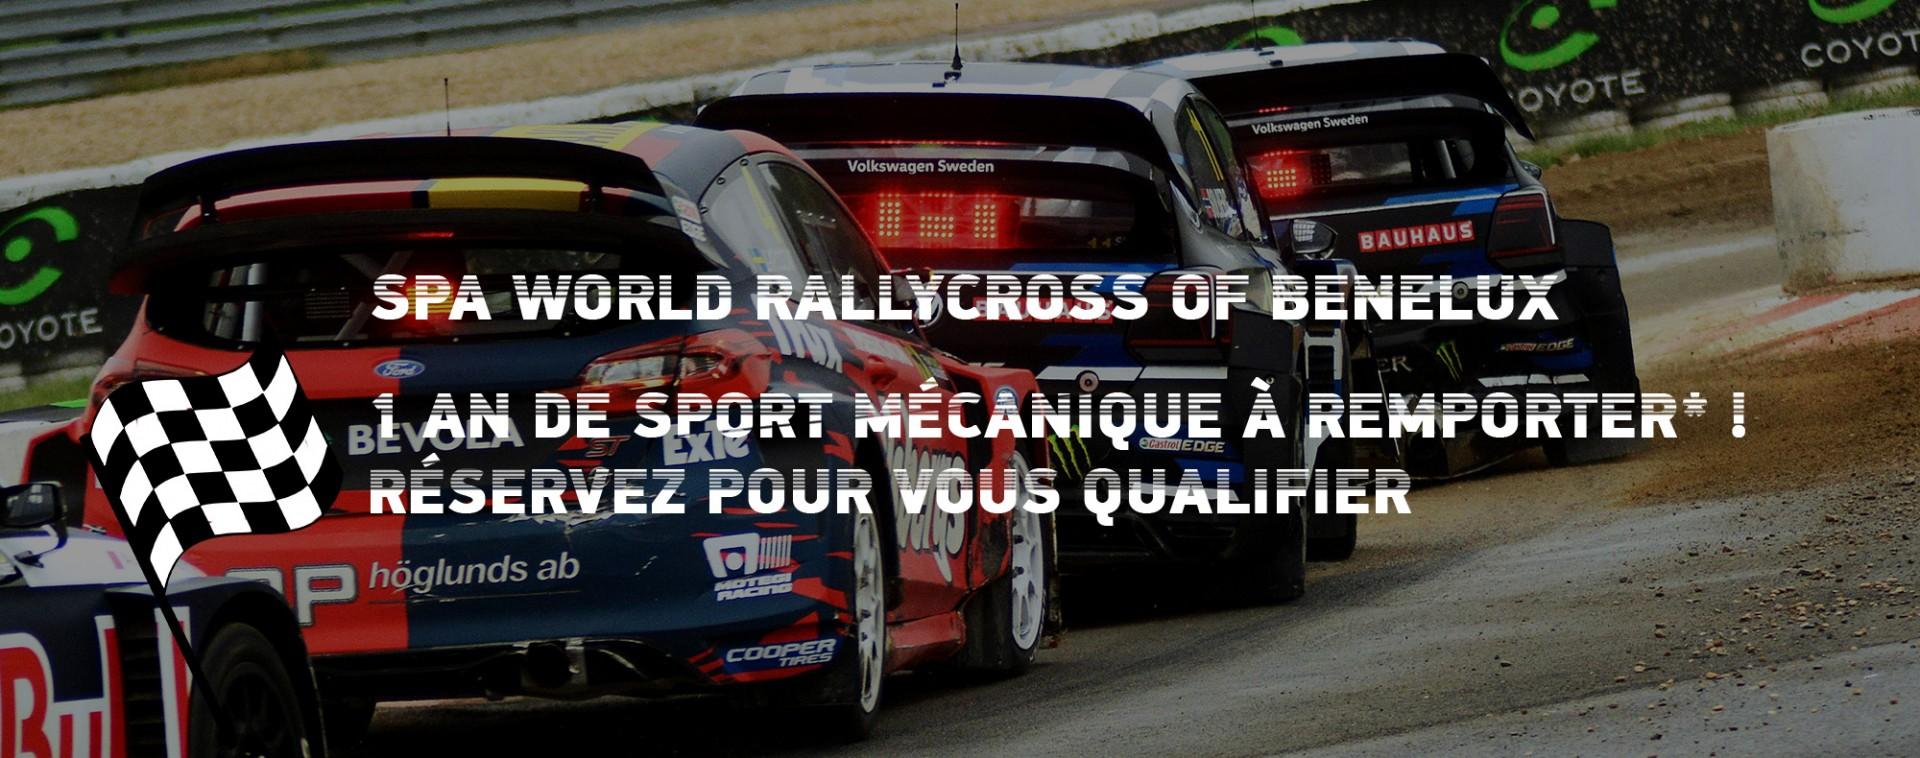 Spa World Rallycross of Benelux   © Loic Abras